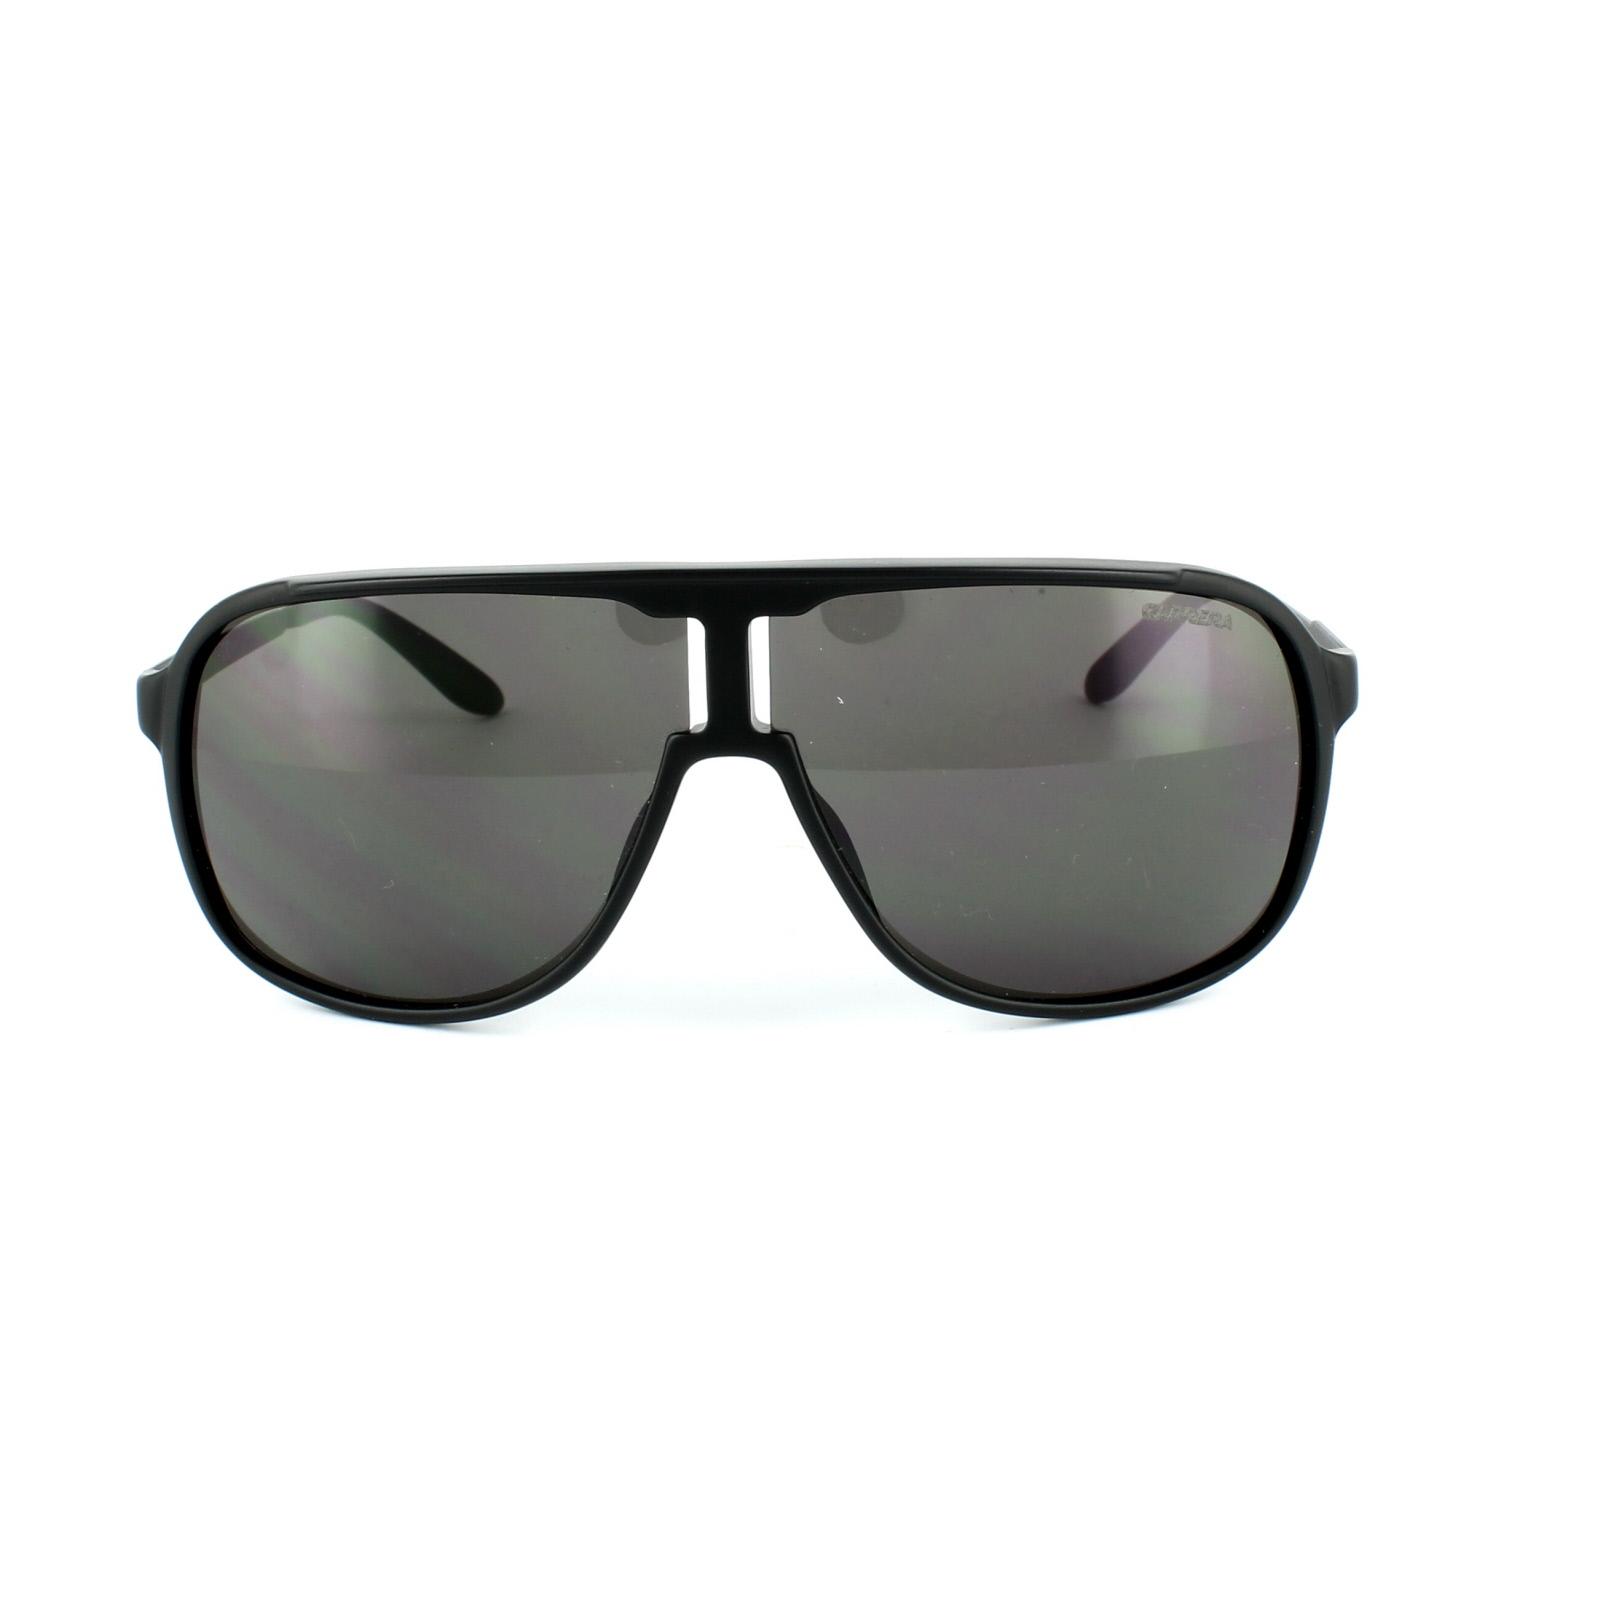 192fc635883 Sentinel Carrera Sunglasses New Safari GTN NR Black Brown Grey